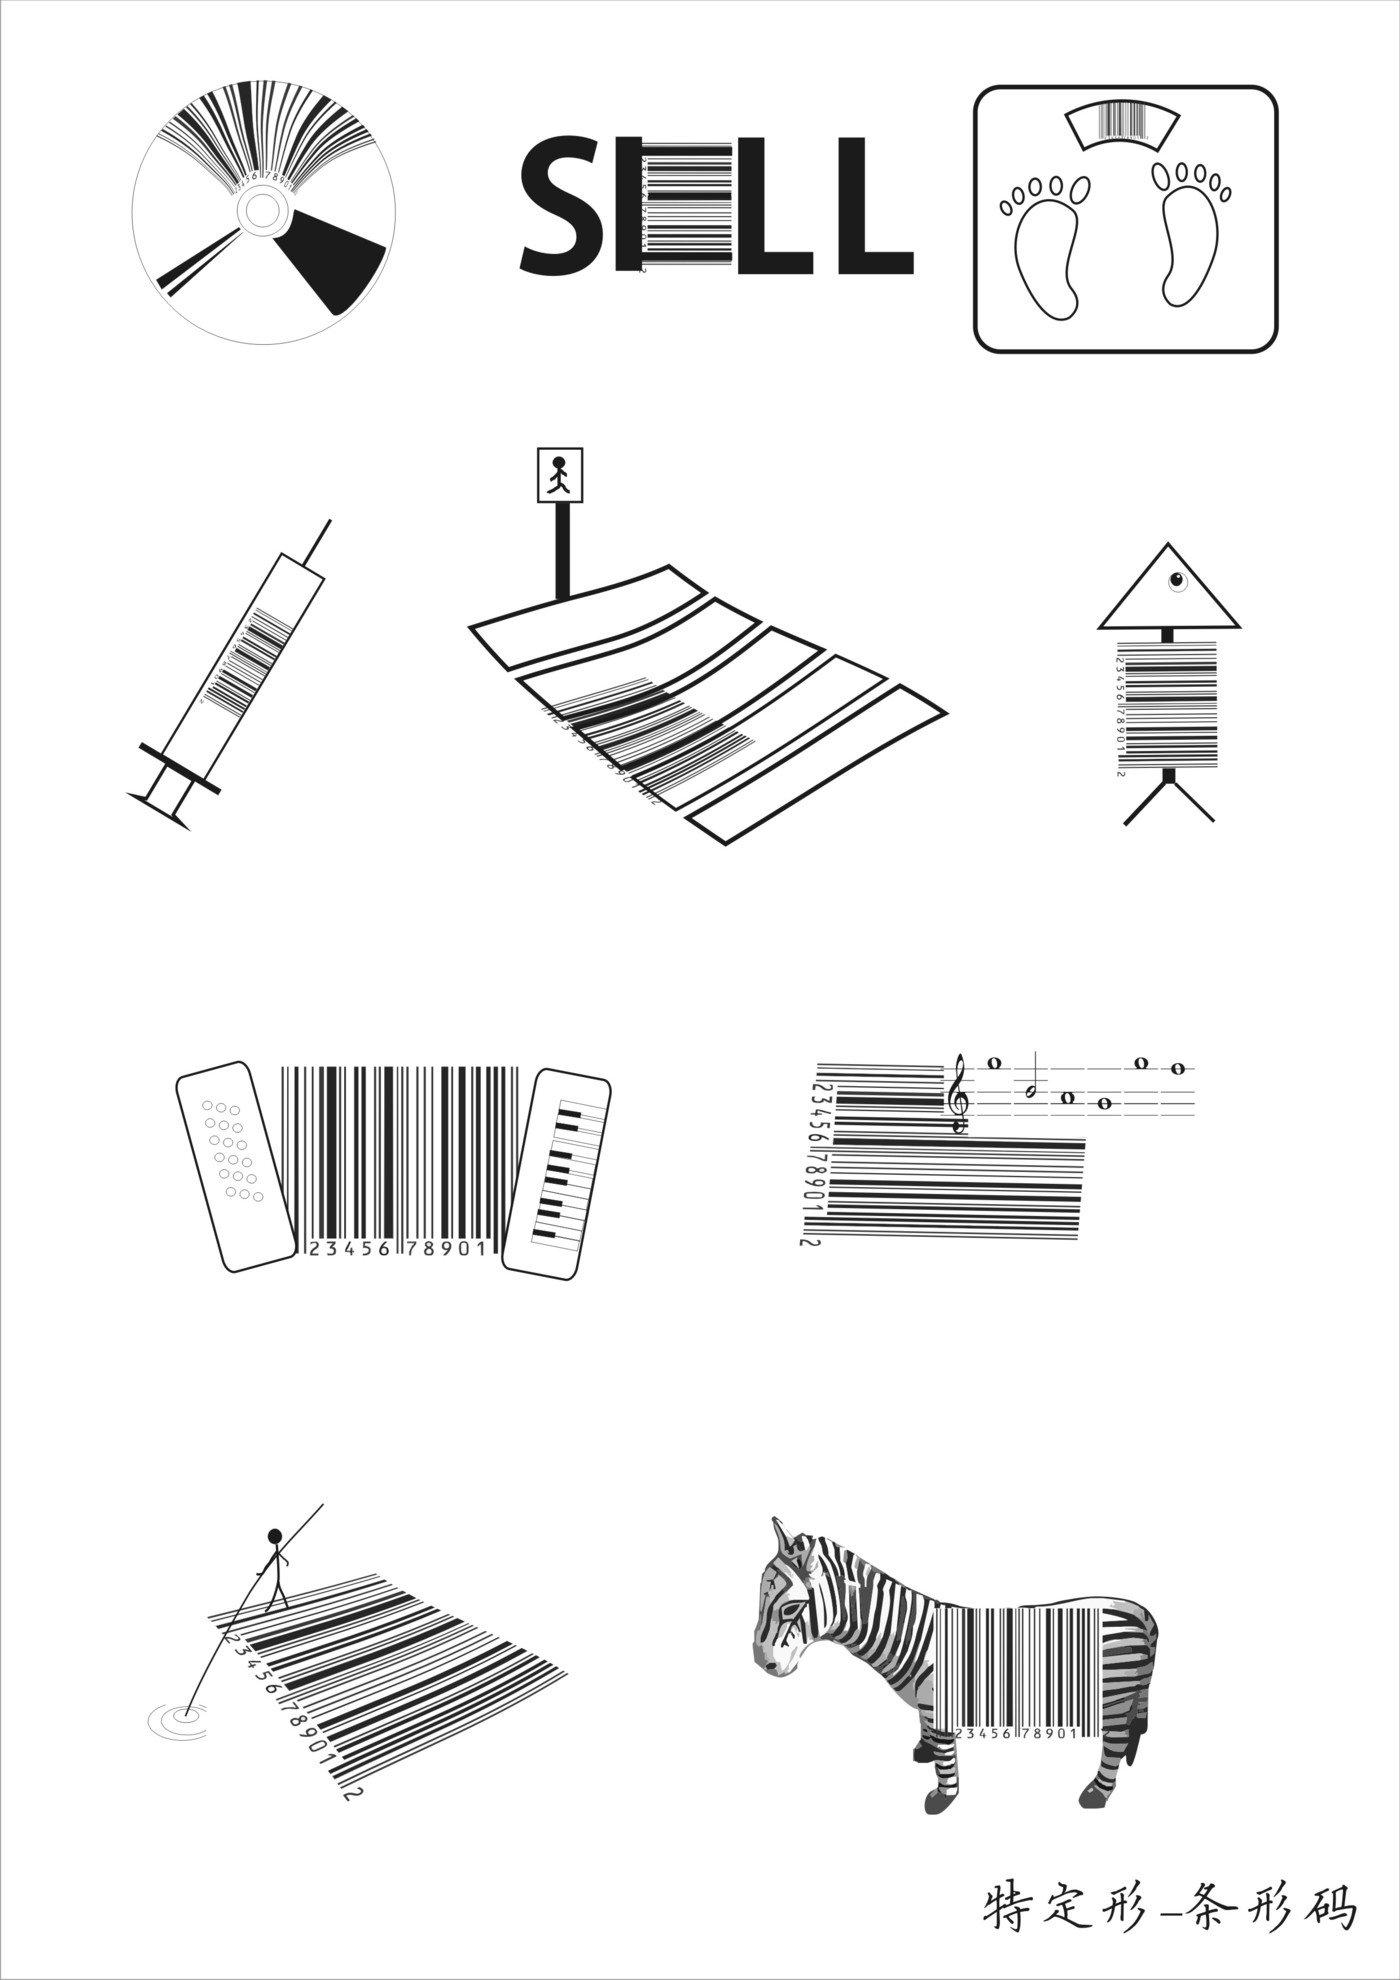 Practical Works by Yuankai Wu at Coroflot.com